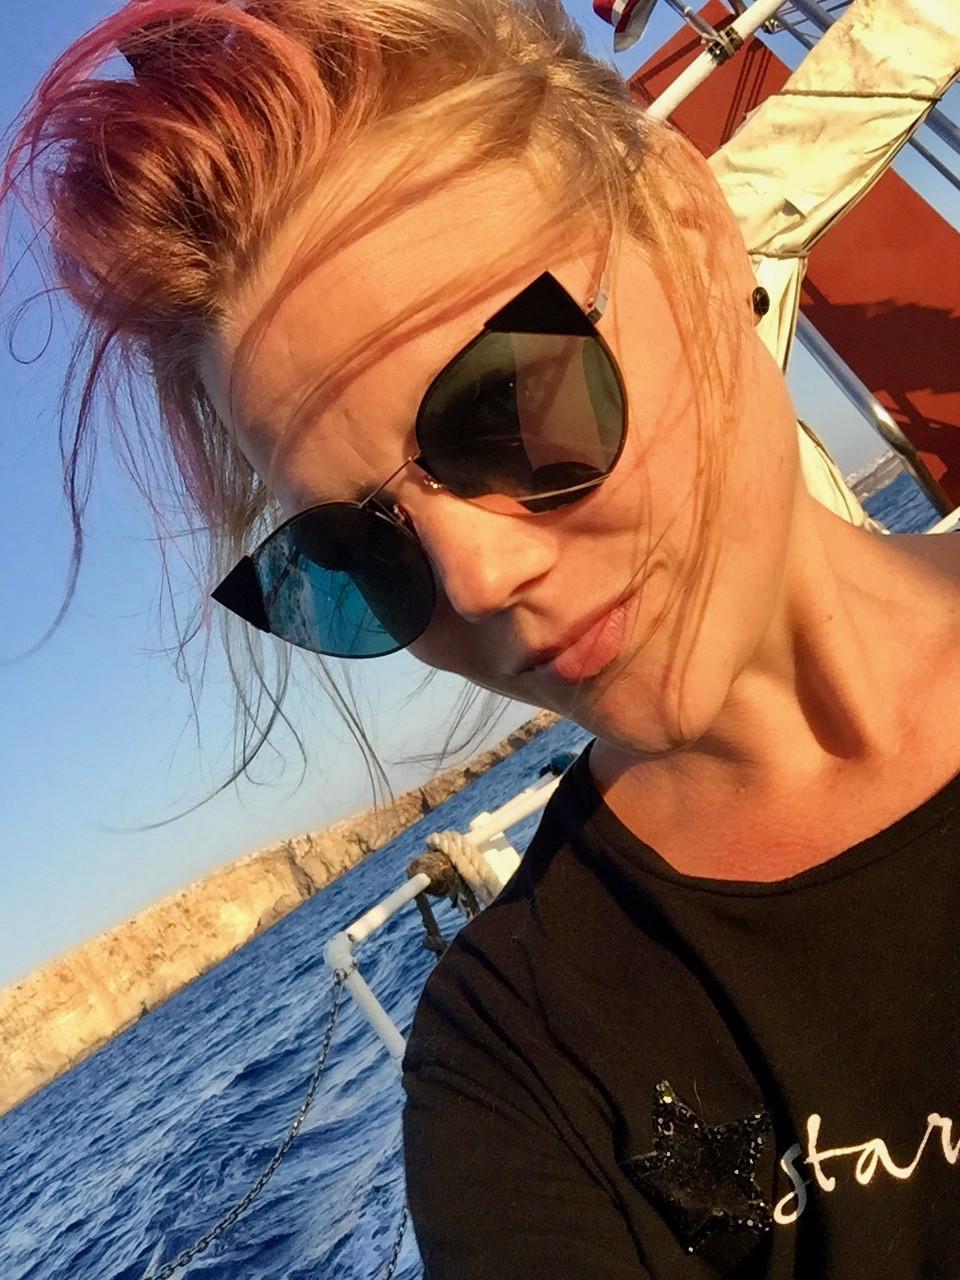 comino hotel punk rock princess malta